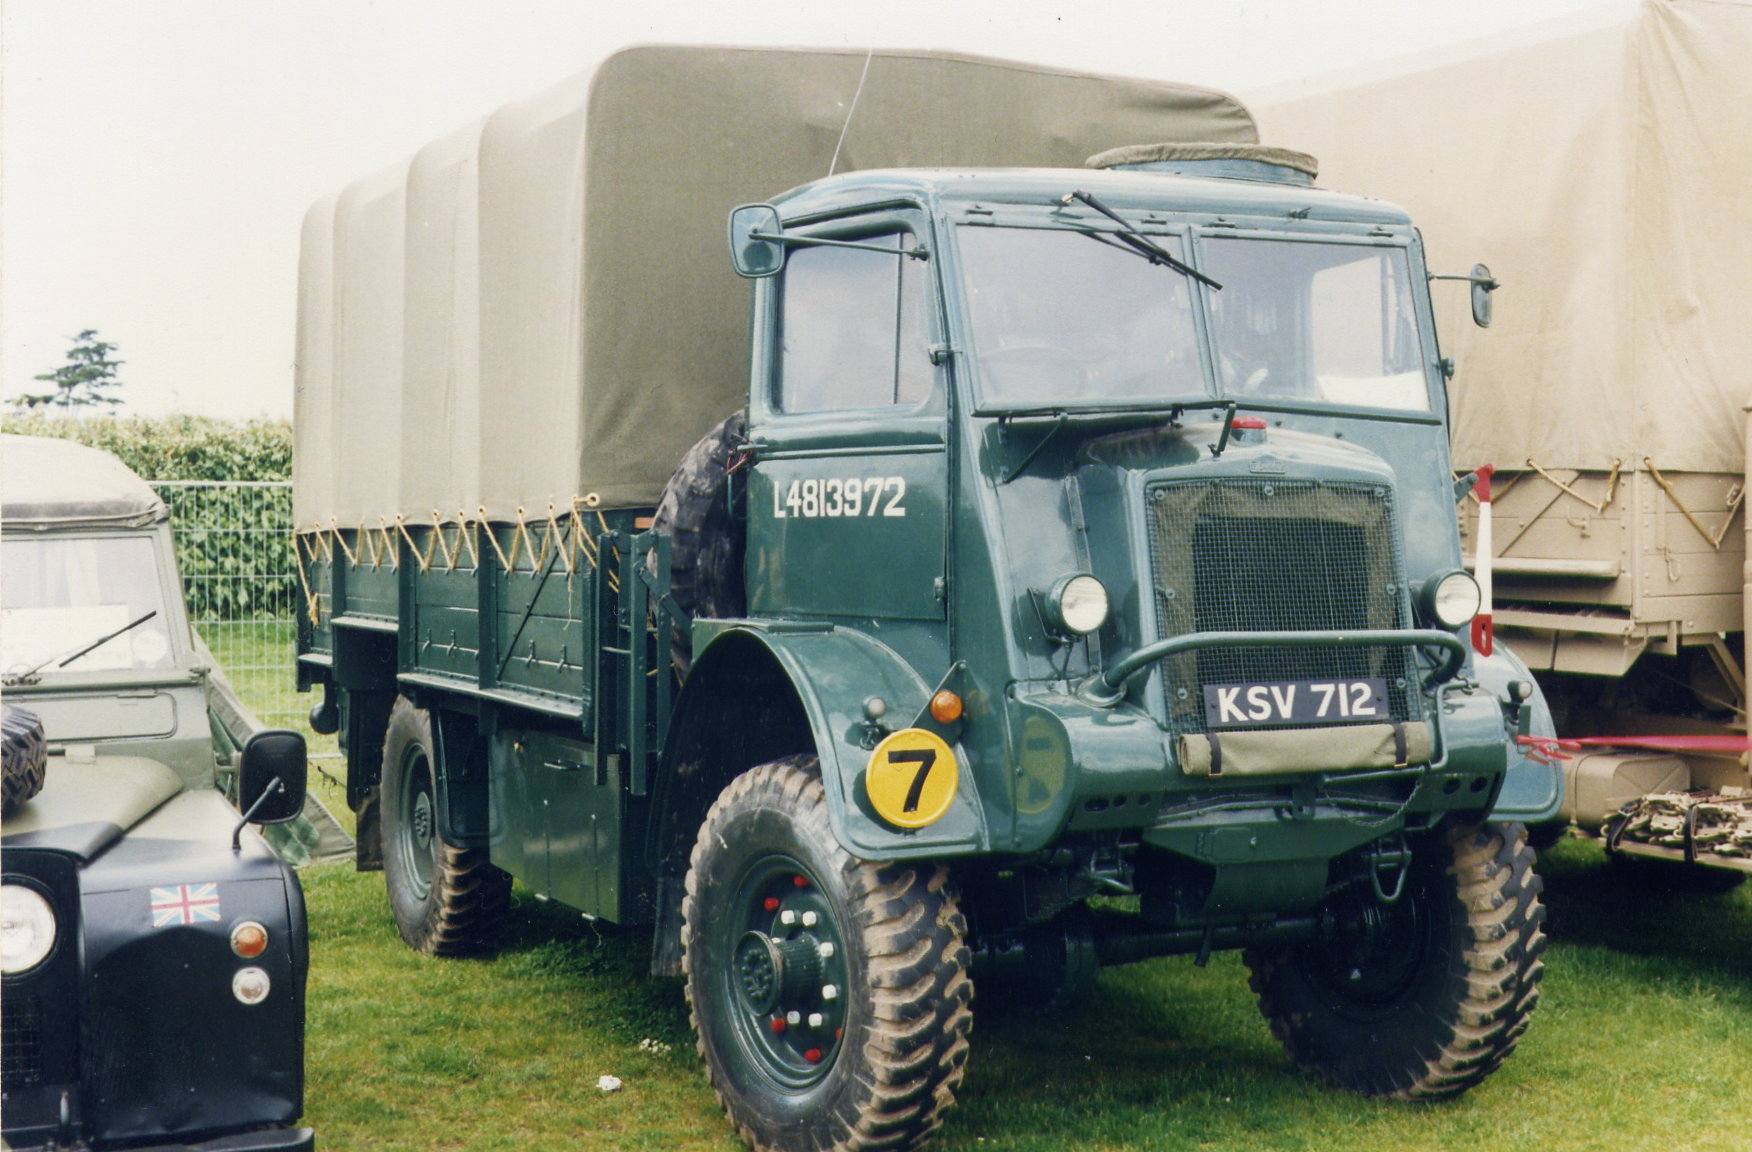 bedford-qld-3ton-gs-ksv-712.jpg